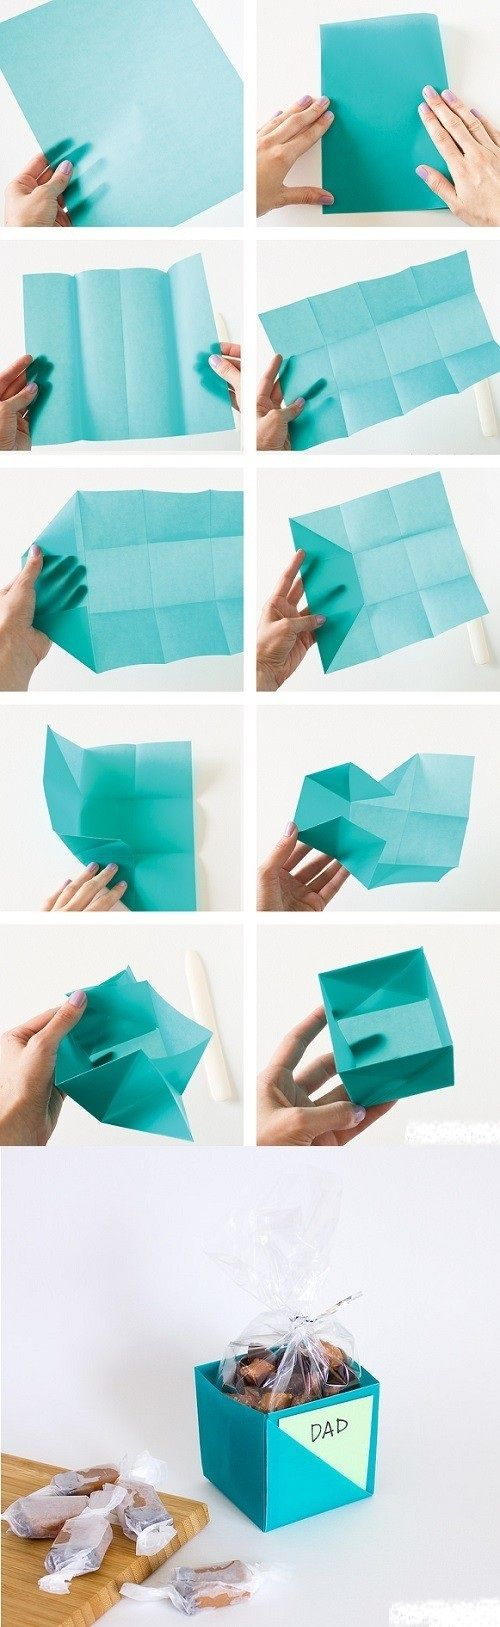 Diy semplice scatola regalo da carta